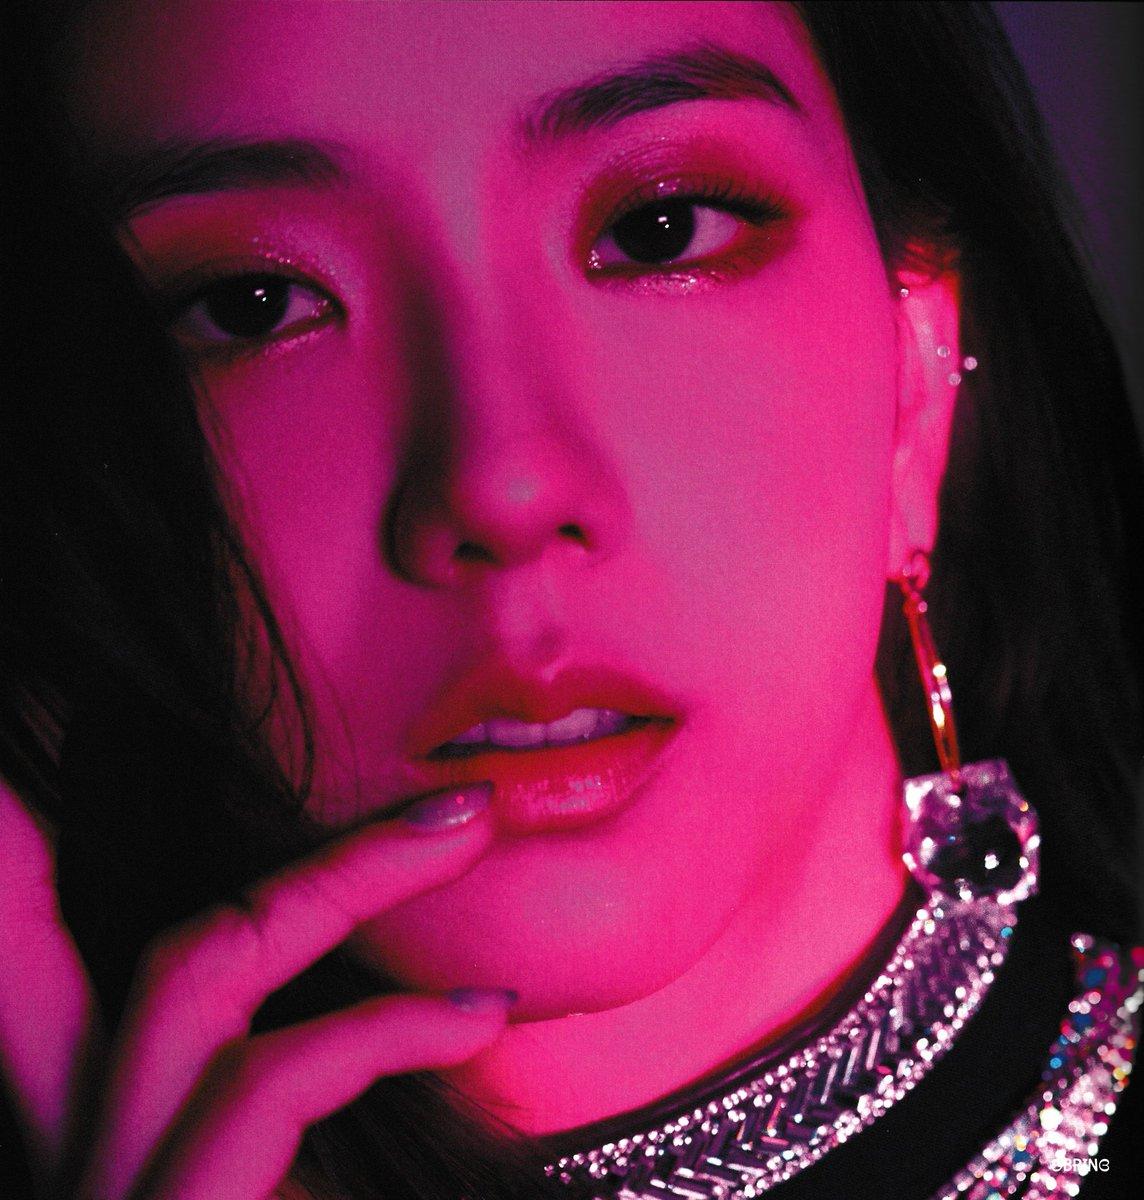 Blackpink Nghe Tải Album Blackpink: #จีซู Hashtag On Twitter